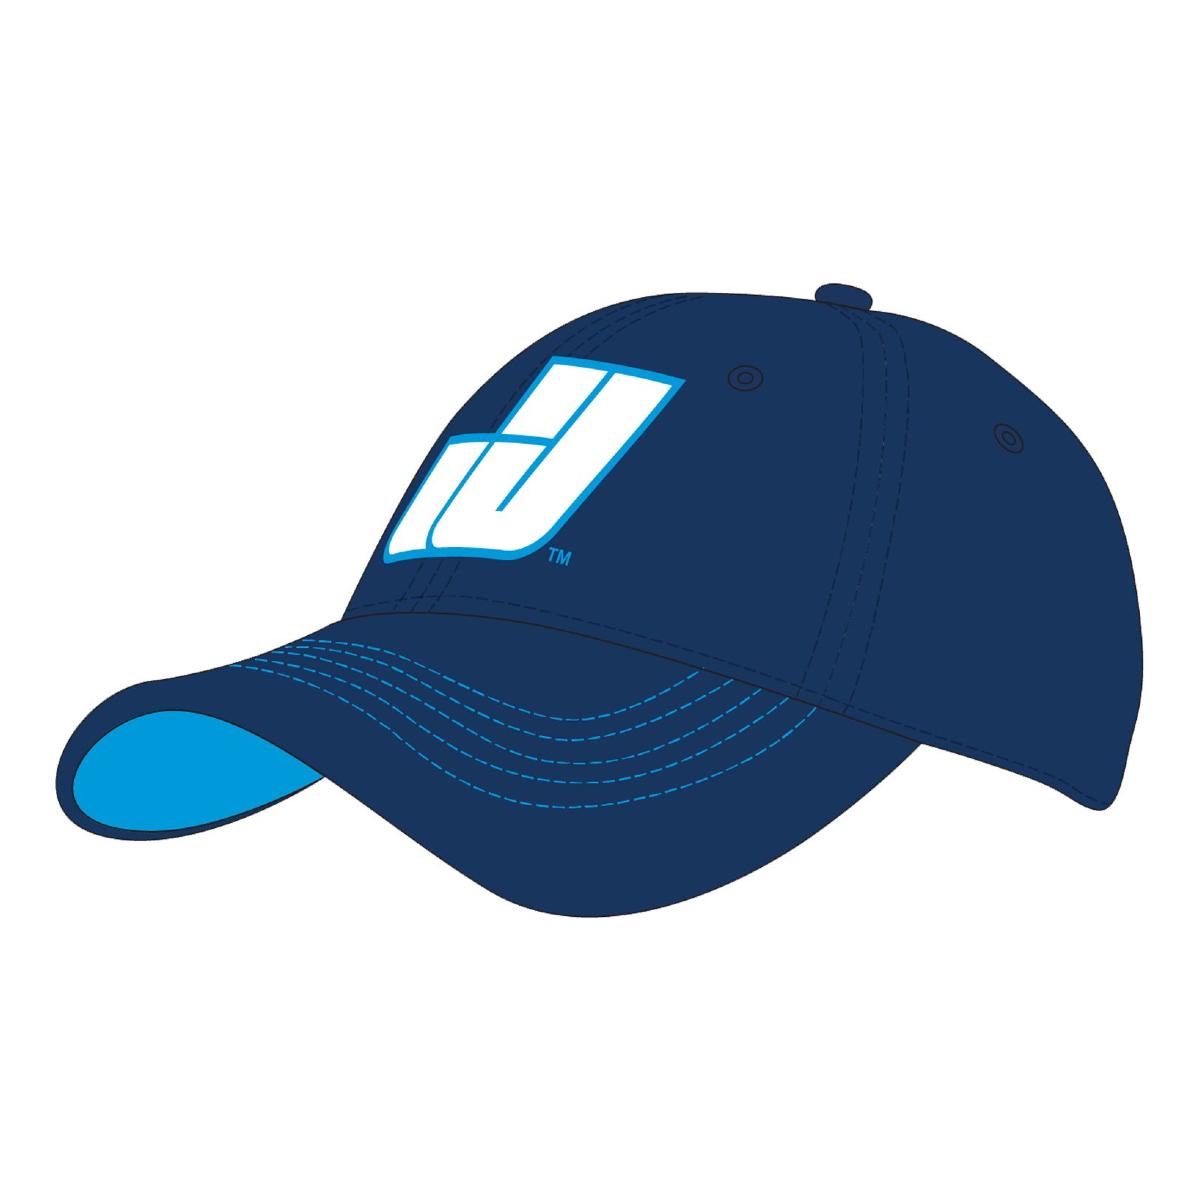 Jimmie Johnson #48 2021 Initials Indycar Hat